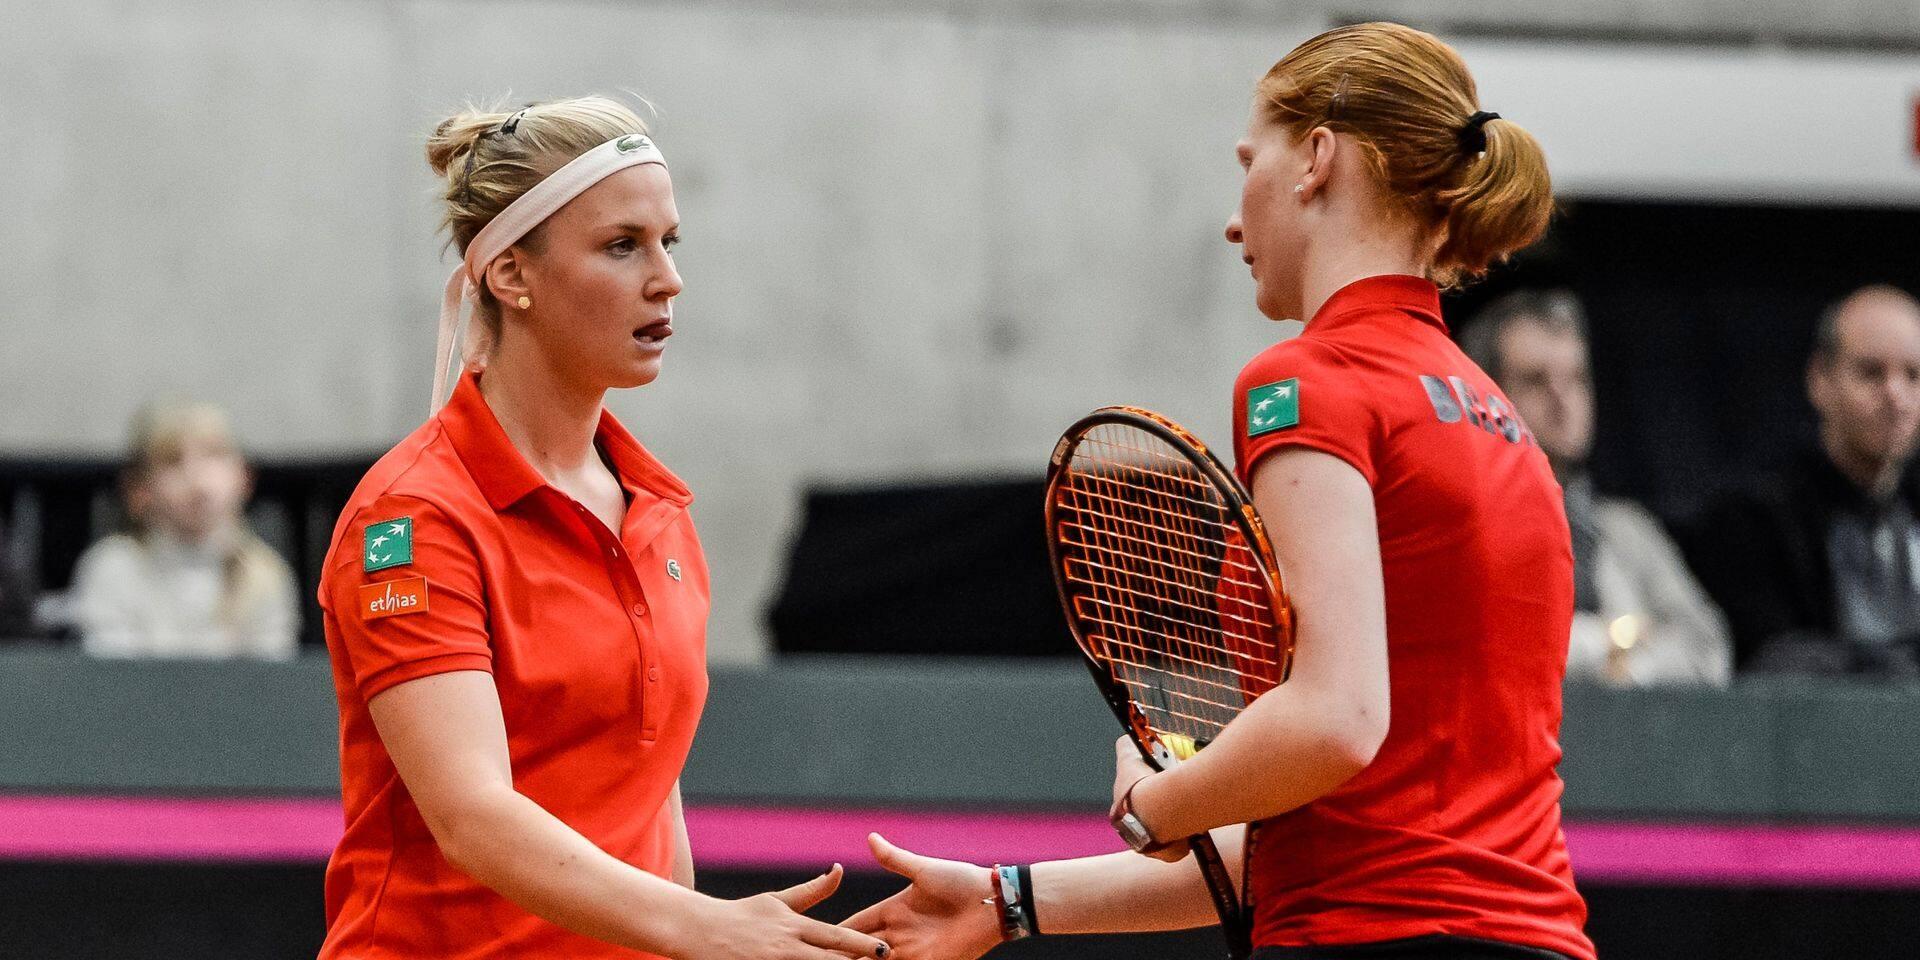 WTA Linz: Alison Van Uytvanck opposée à Ysaline Bonaventure au 1er tour